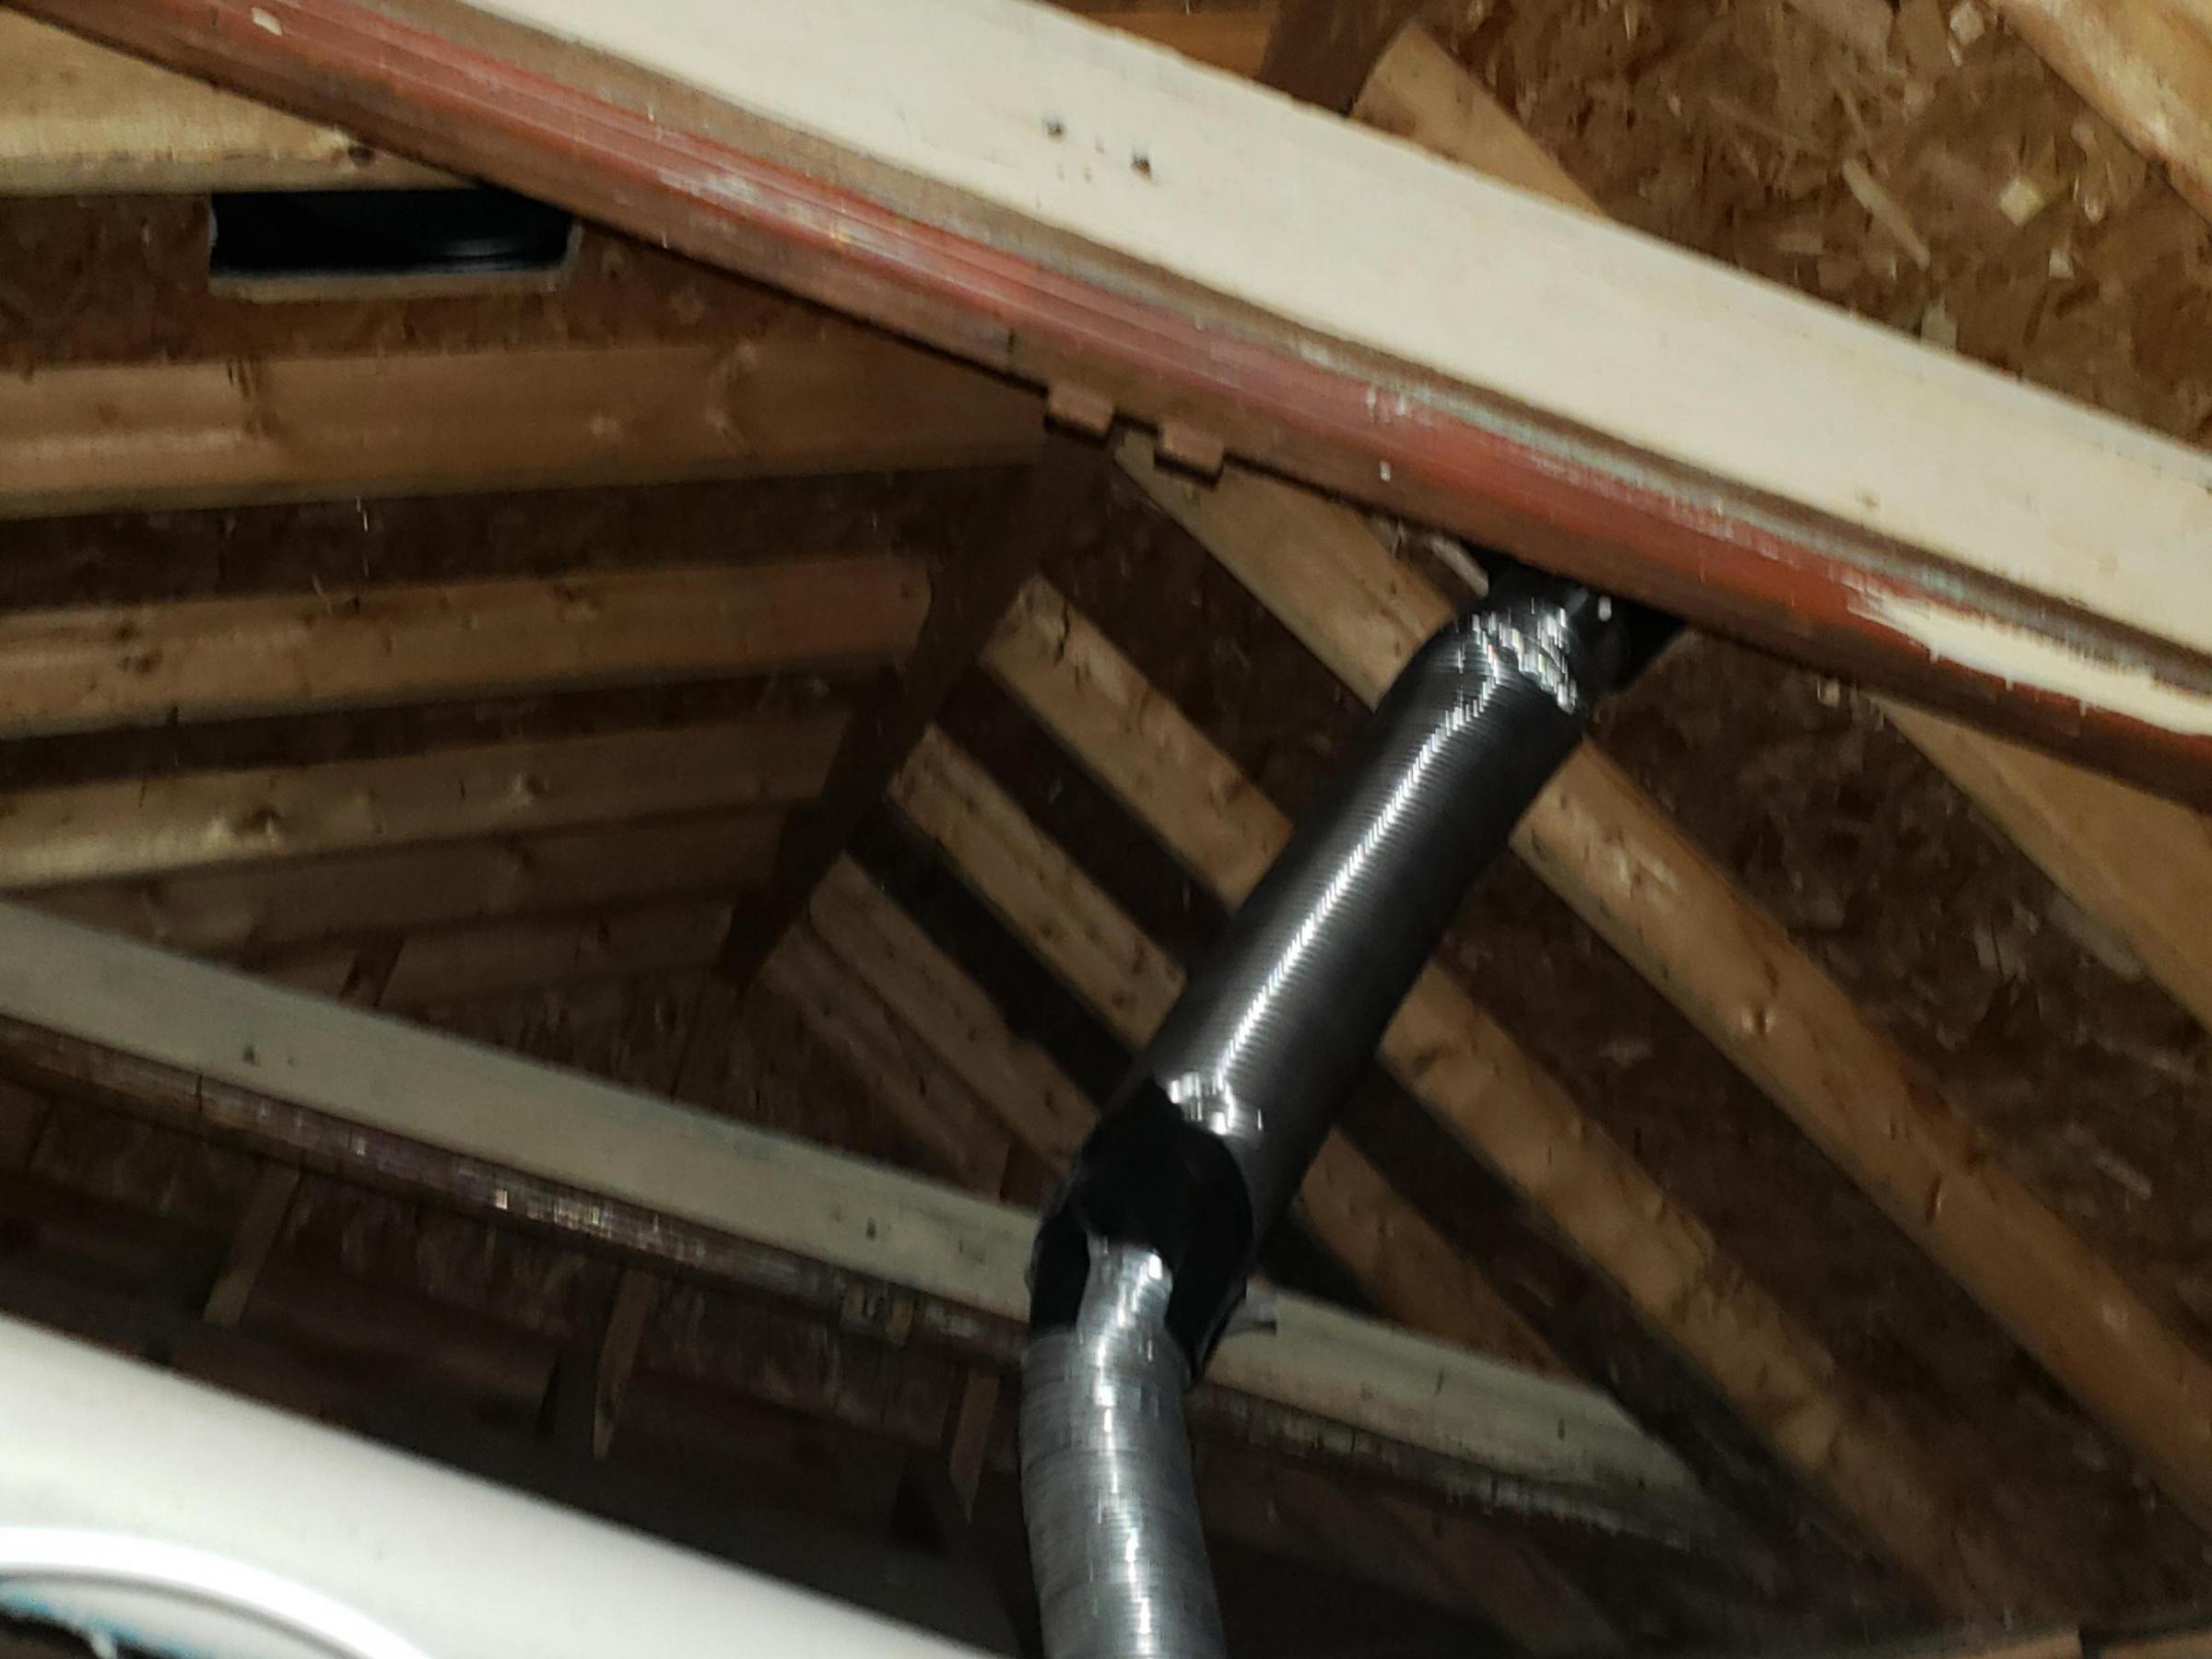 Insulation on no attic roof.-20190313_183718_1552601631530.jpg